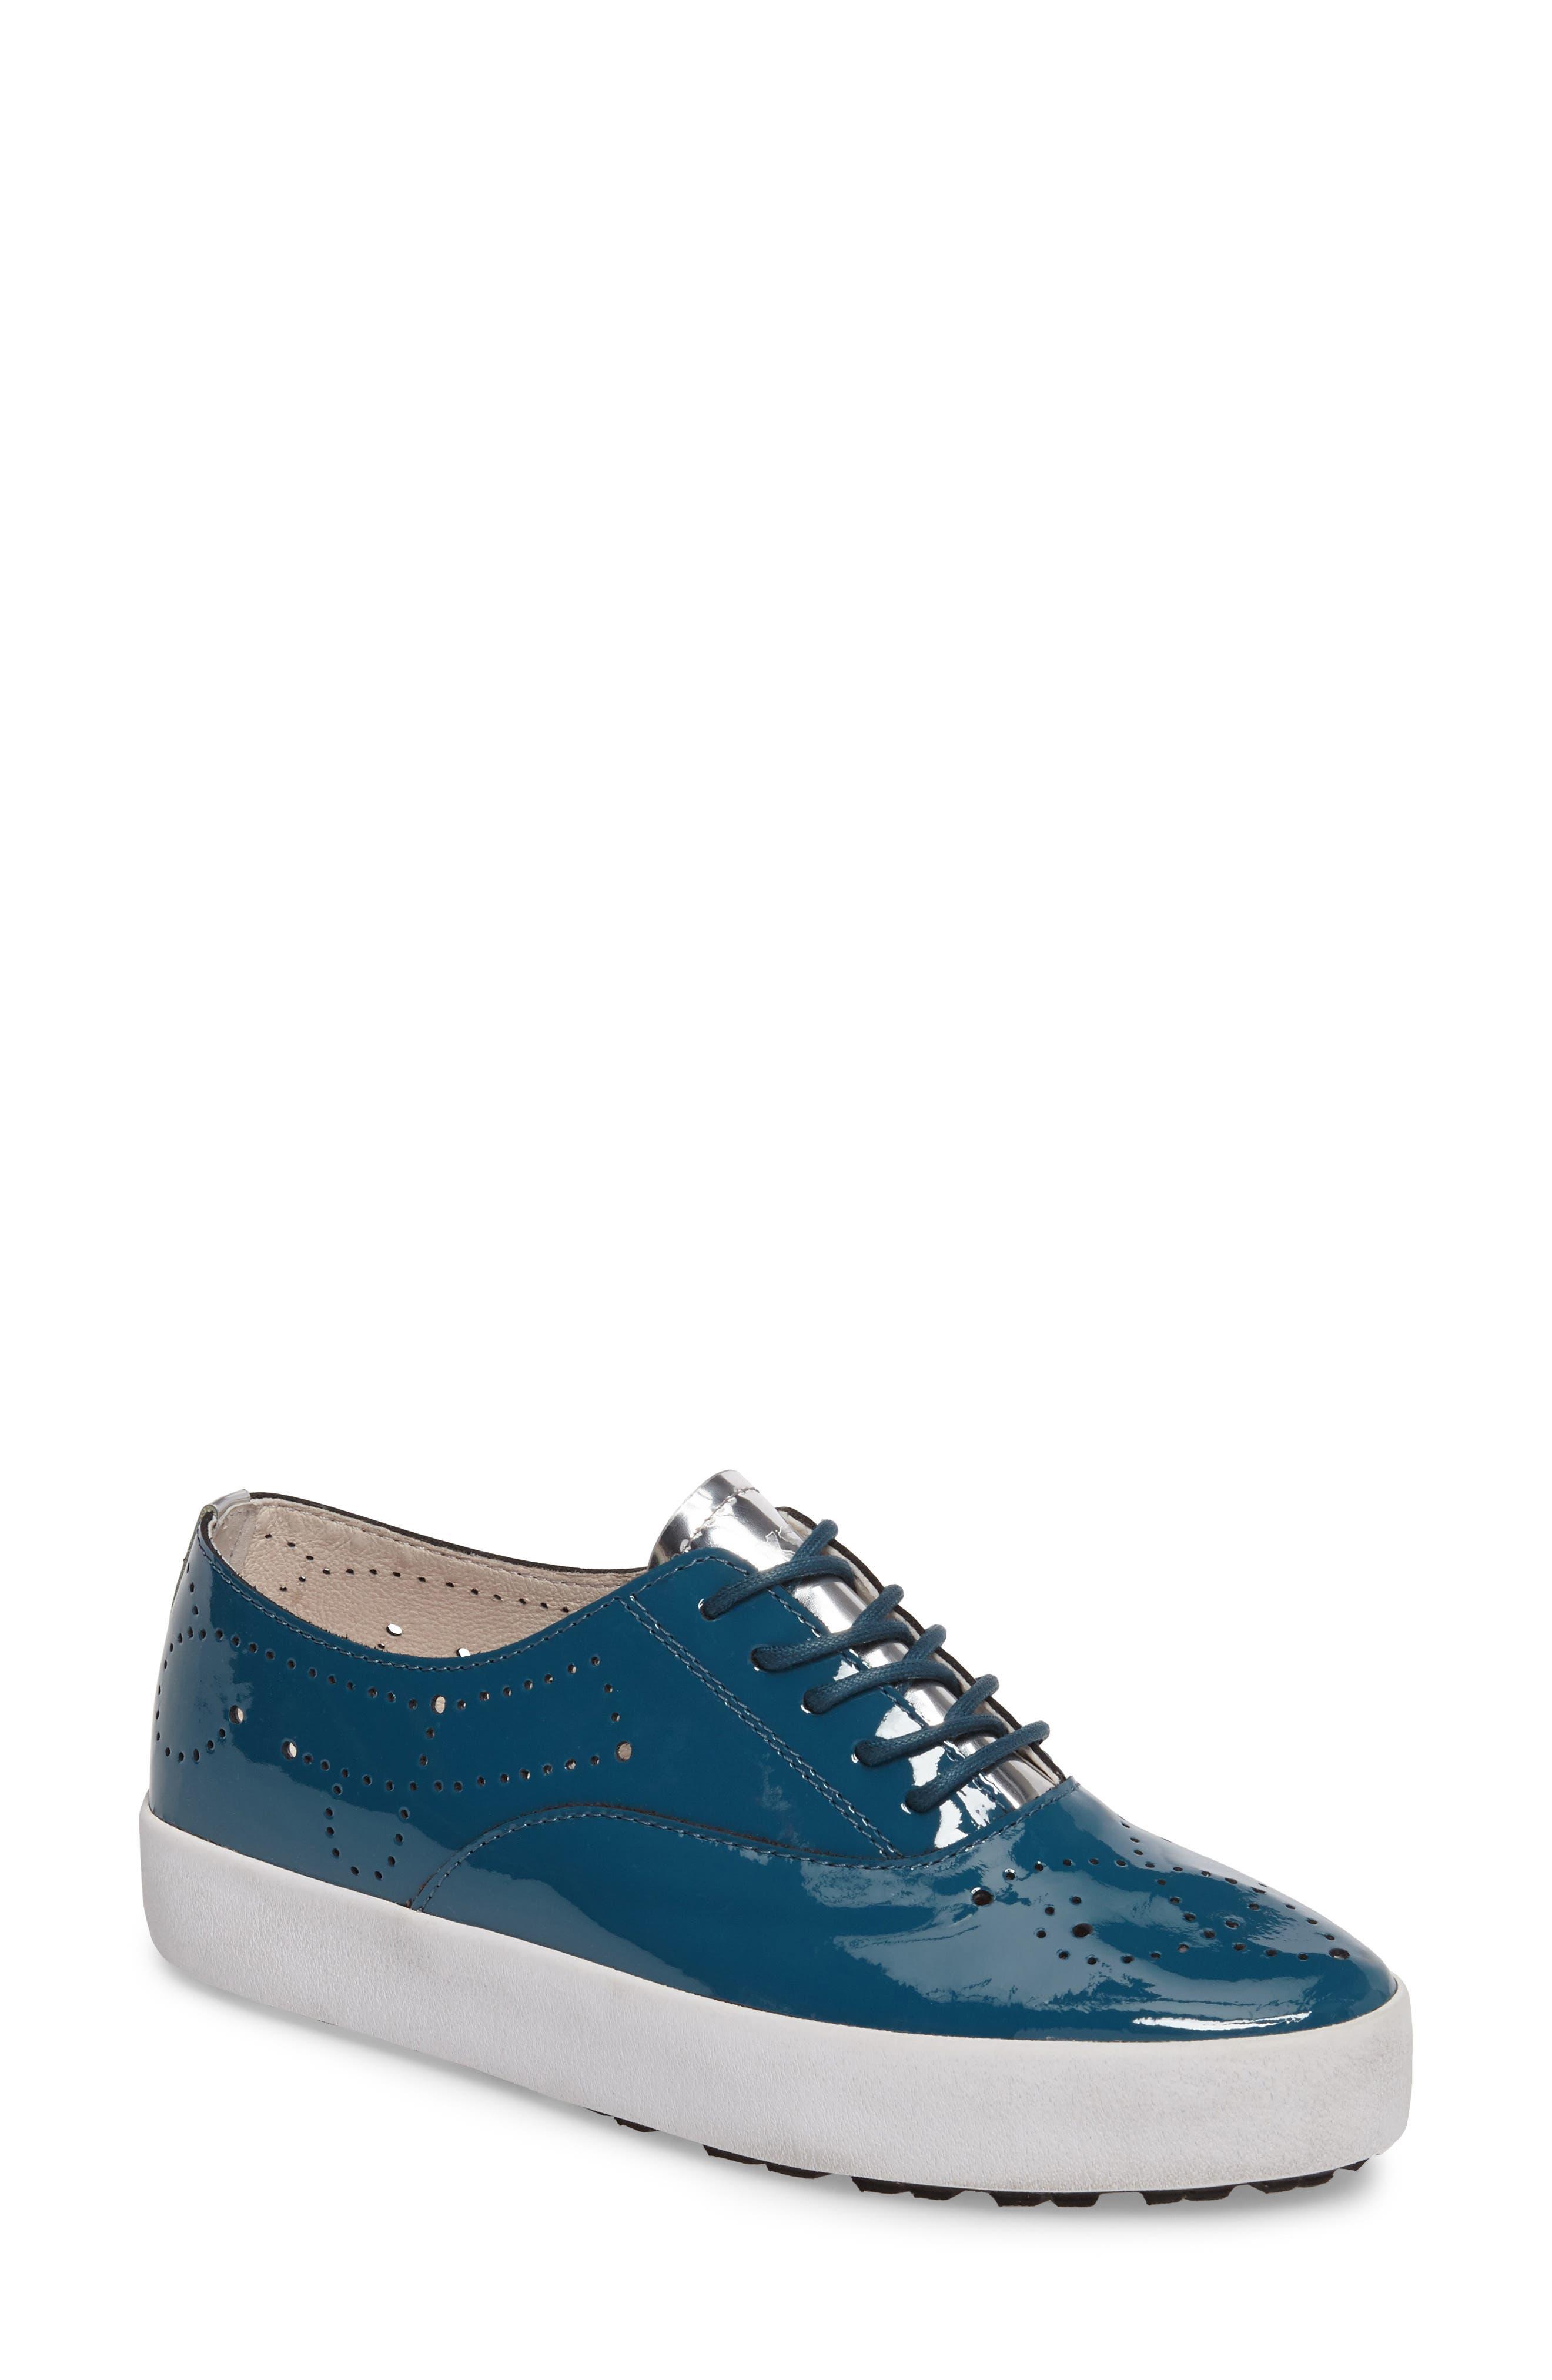 NL41 Sneaker,                             Main thumbnail 1, color,